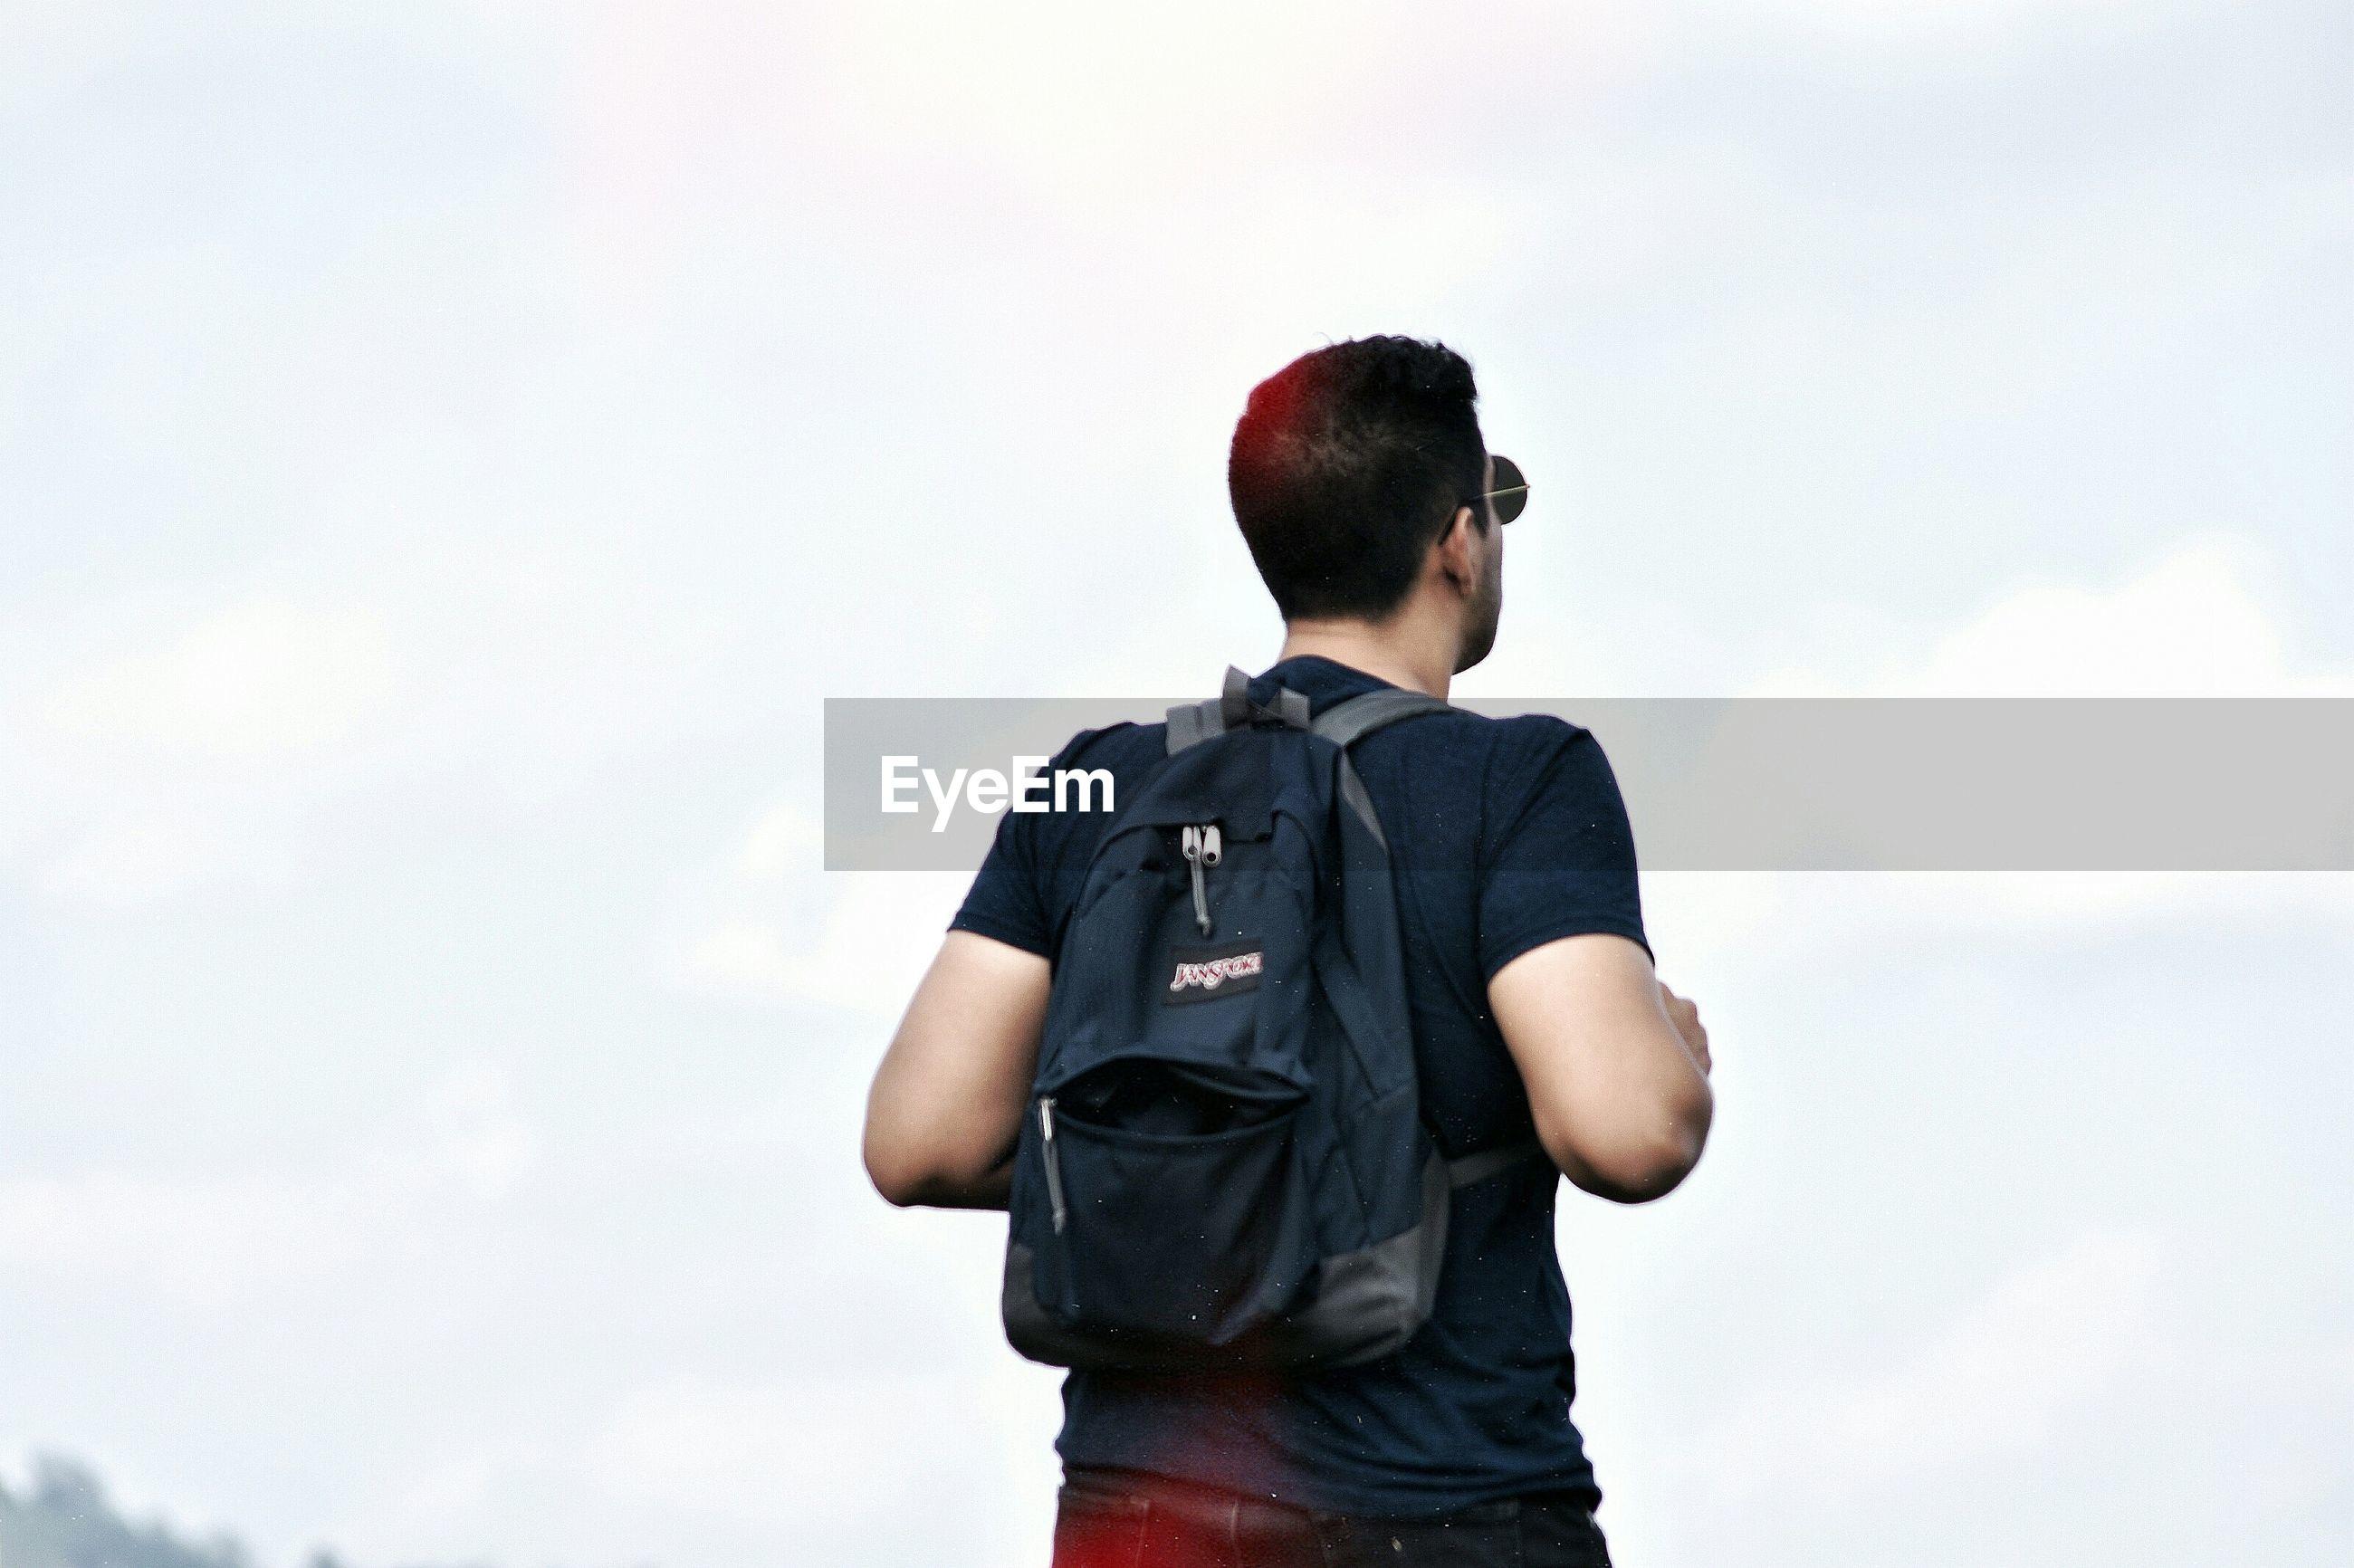 REAR VIEW OF BOY STANDING IN SKY